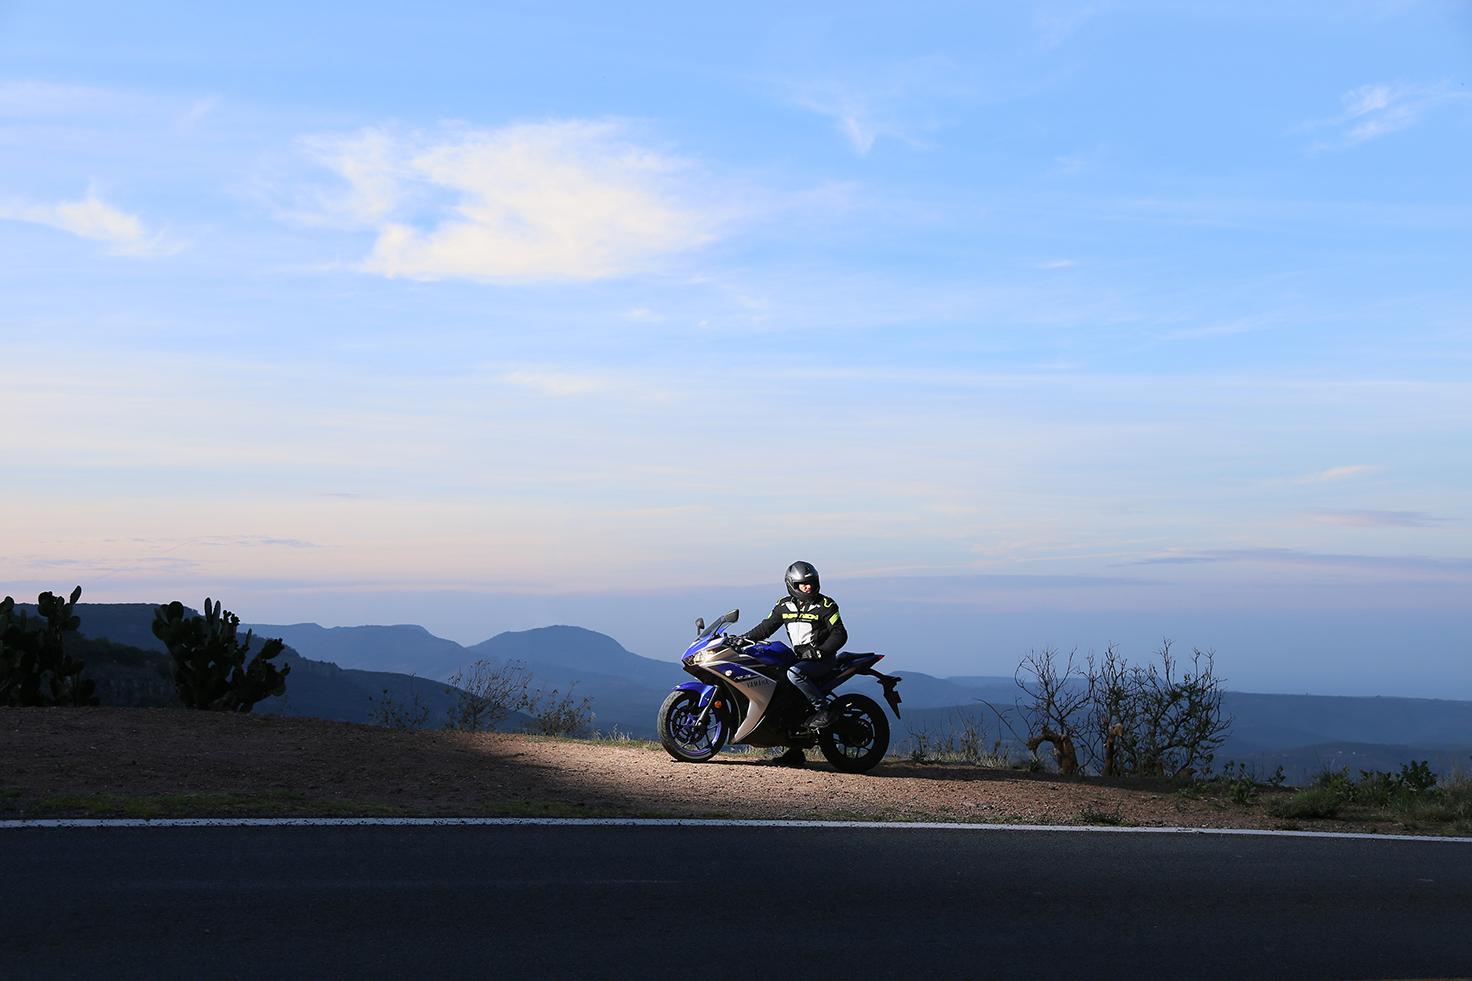 Maroge-Angela-Velazquez-fotografia-ezequiel-moto-6